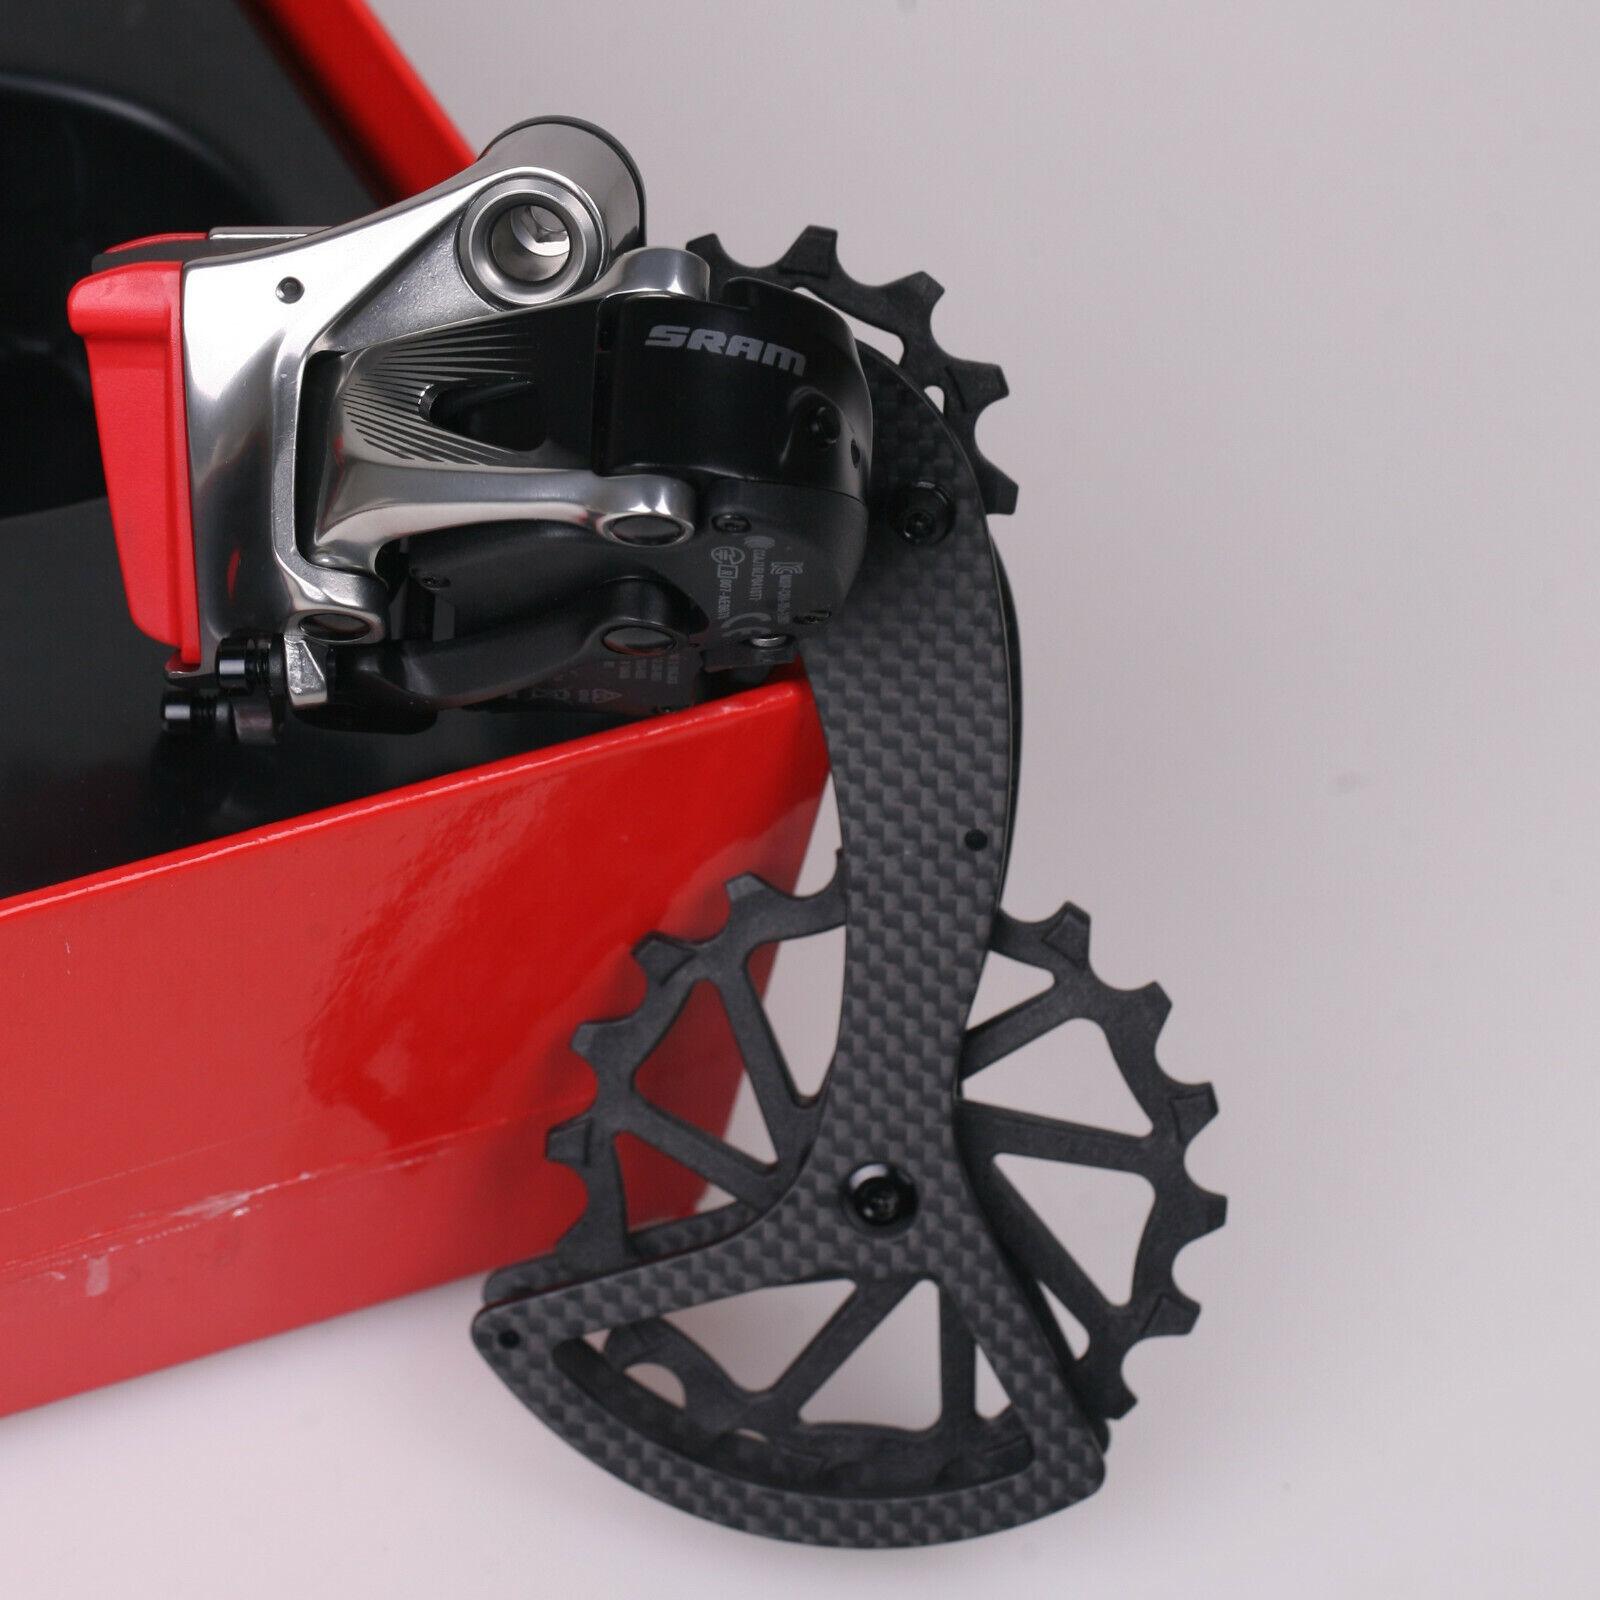 J&L Ceramic&Carbon OverDimensioned Derailleur Pulley Wheel OSPW for Sram rosso Etap